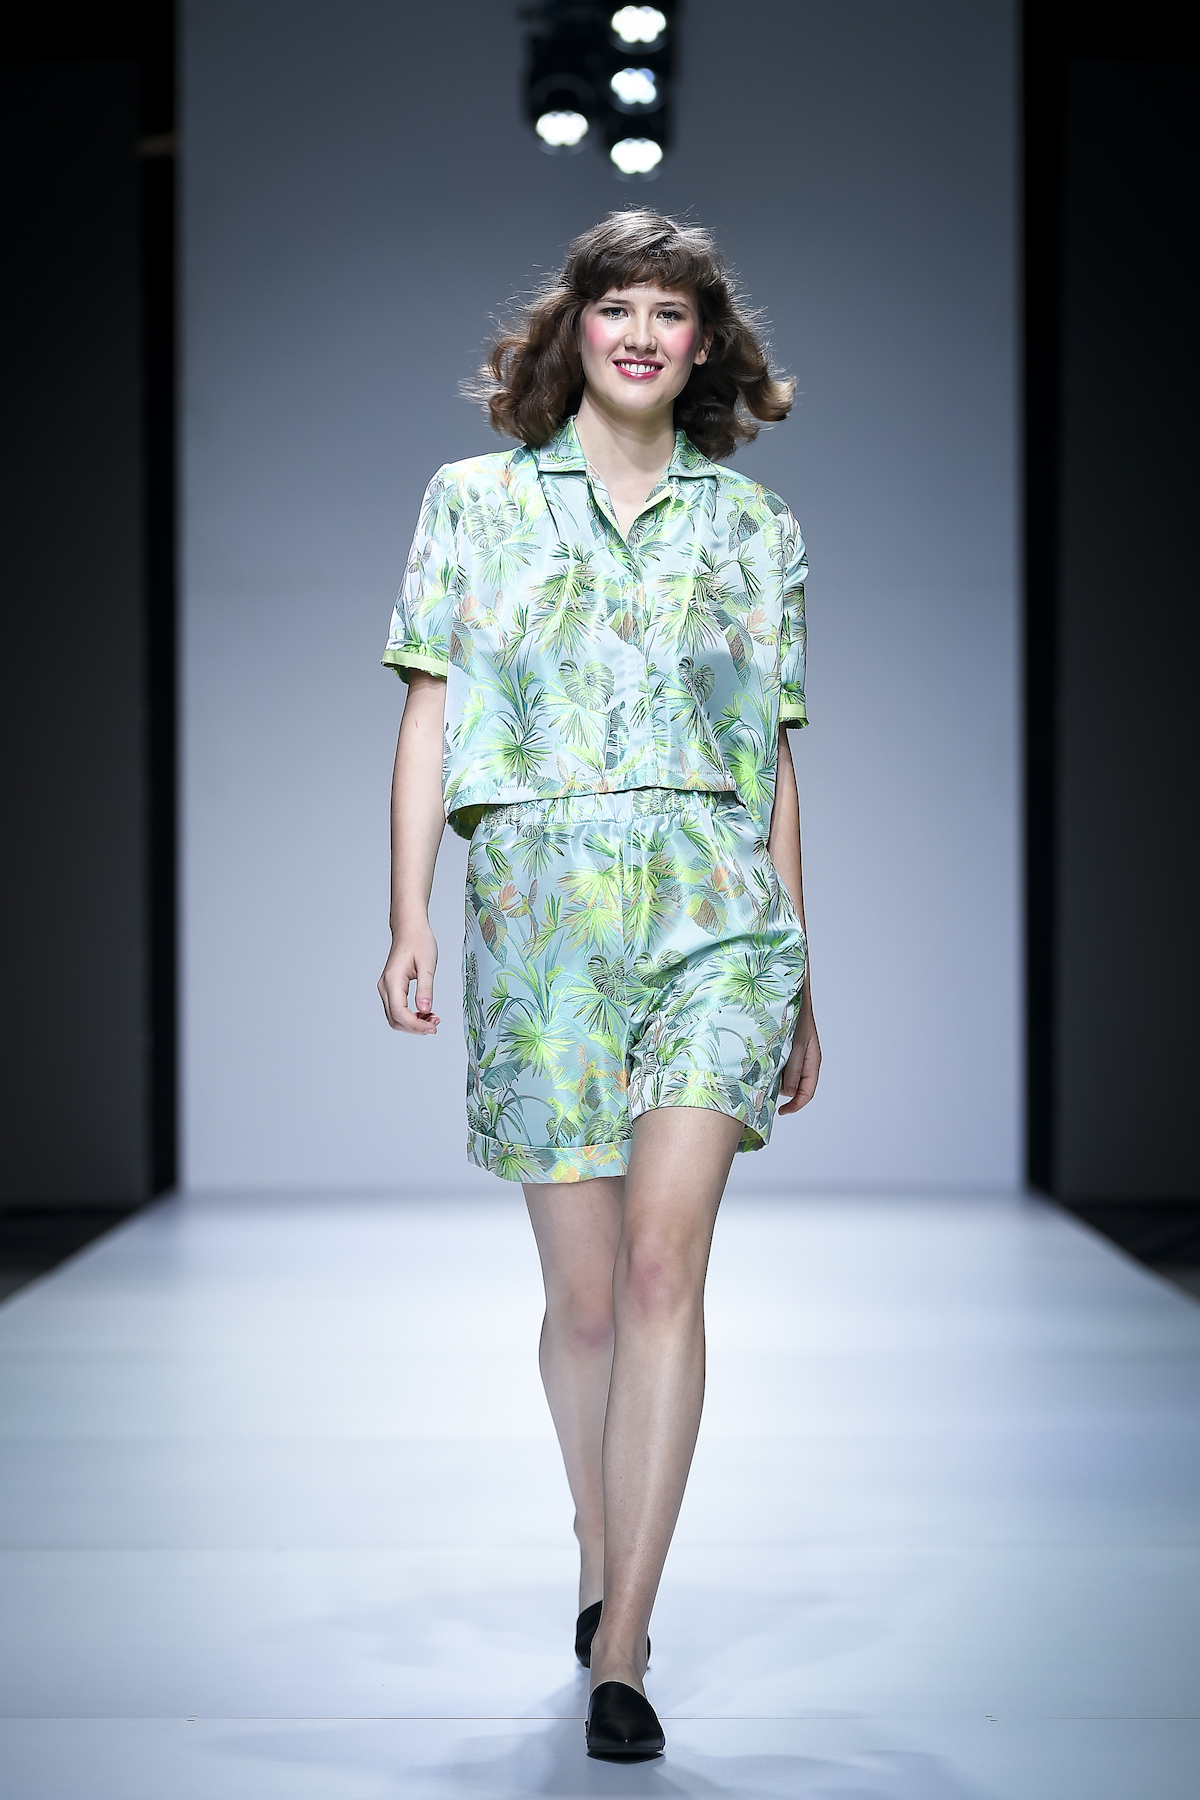 LJFW hlace pajac trajnostna moda pentla concept store beautyfullblog